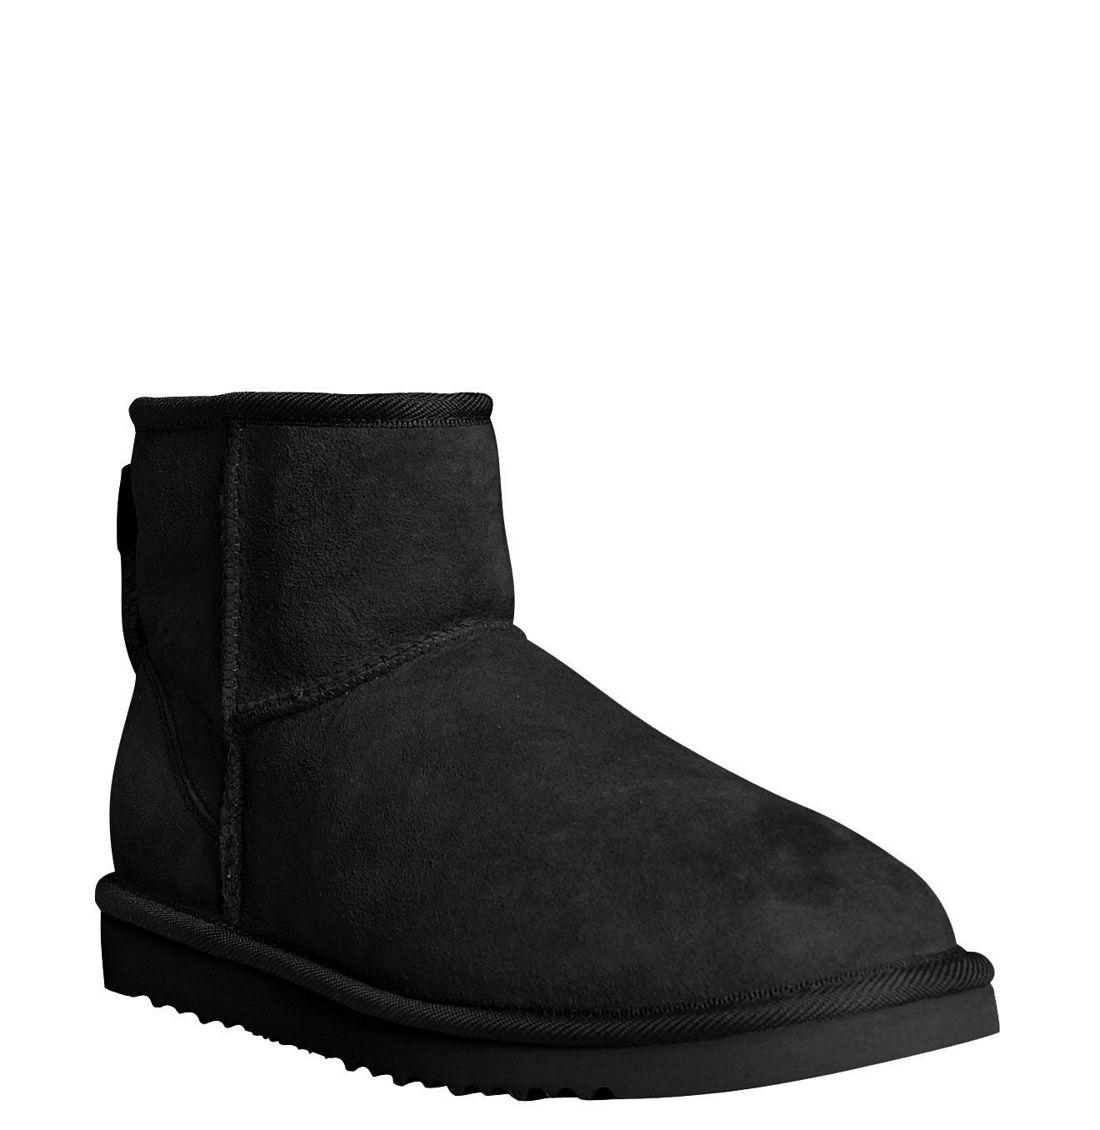 ugg australia classic mini boot in black lyst. Black Bedroom Furniture Sets. Home Design Ideas